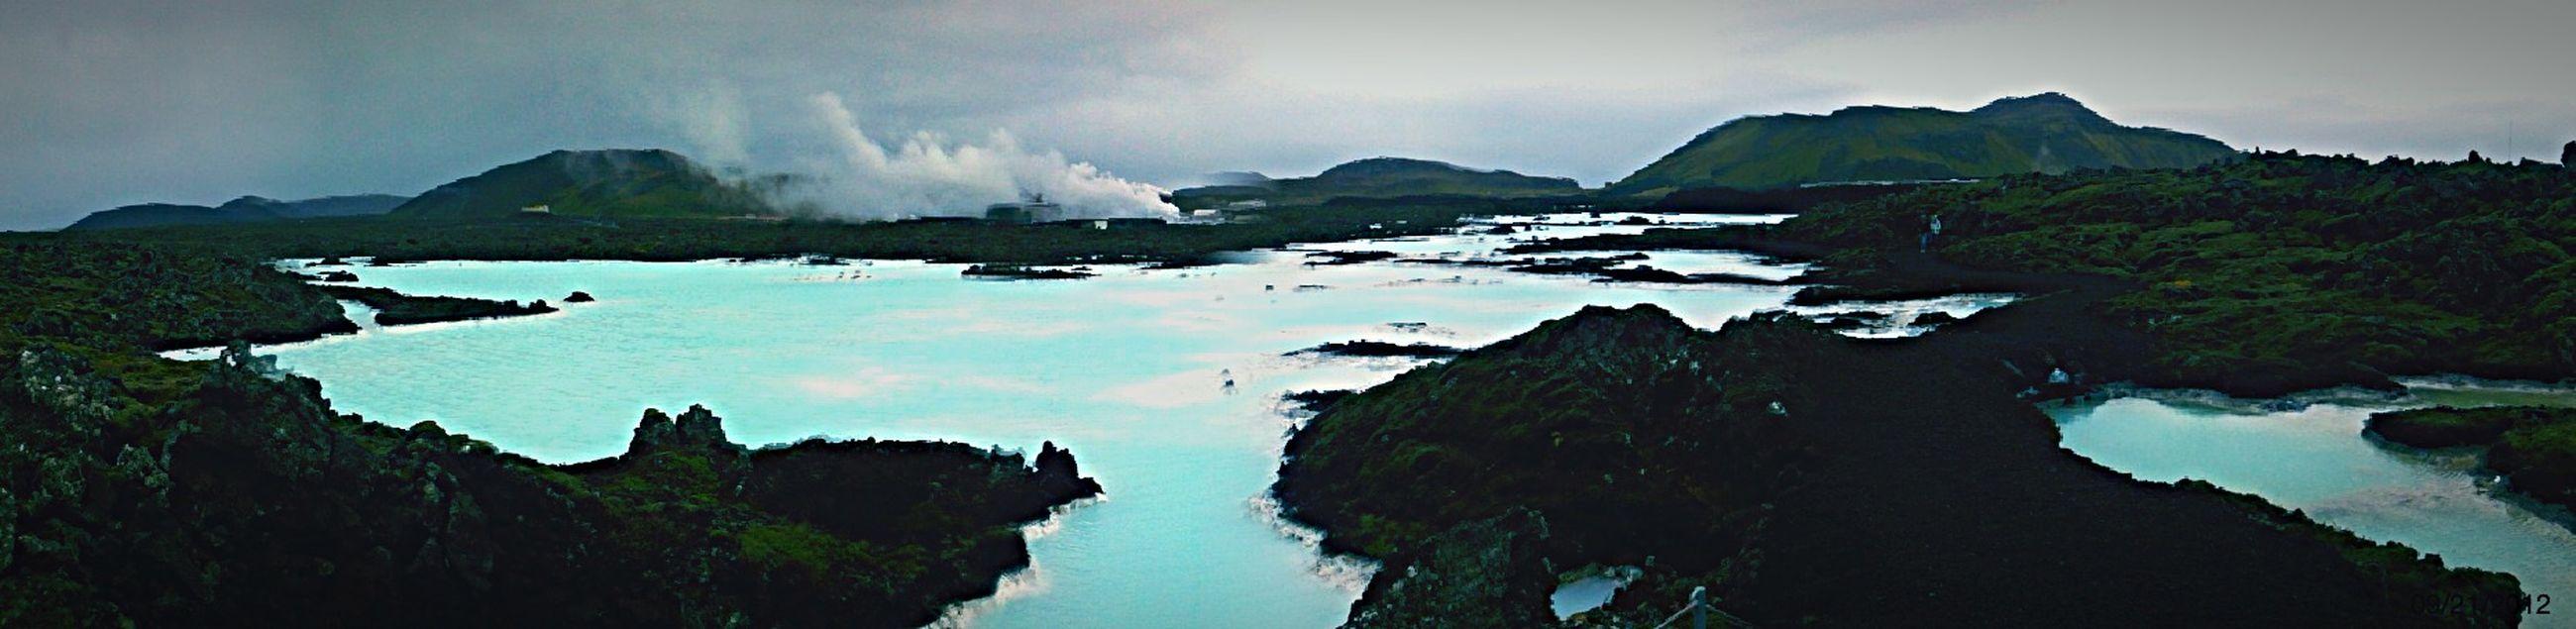 water, sky, mountain, scenics, tranquil scene, tranquility, rock - object, beauty in nature, cloud - sky, sea, nature, rock formation, lake, reflection, cloud, idyllic, mountain range, waterfront, rock, non-urban scene